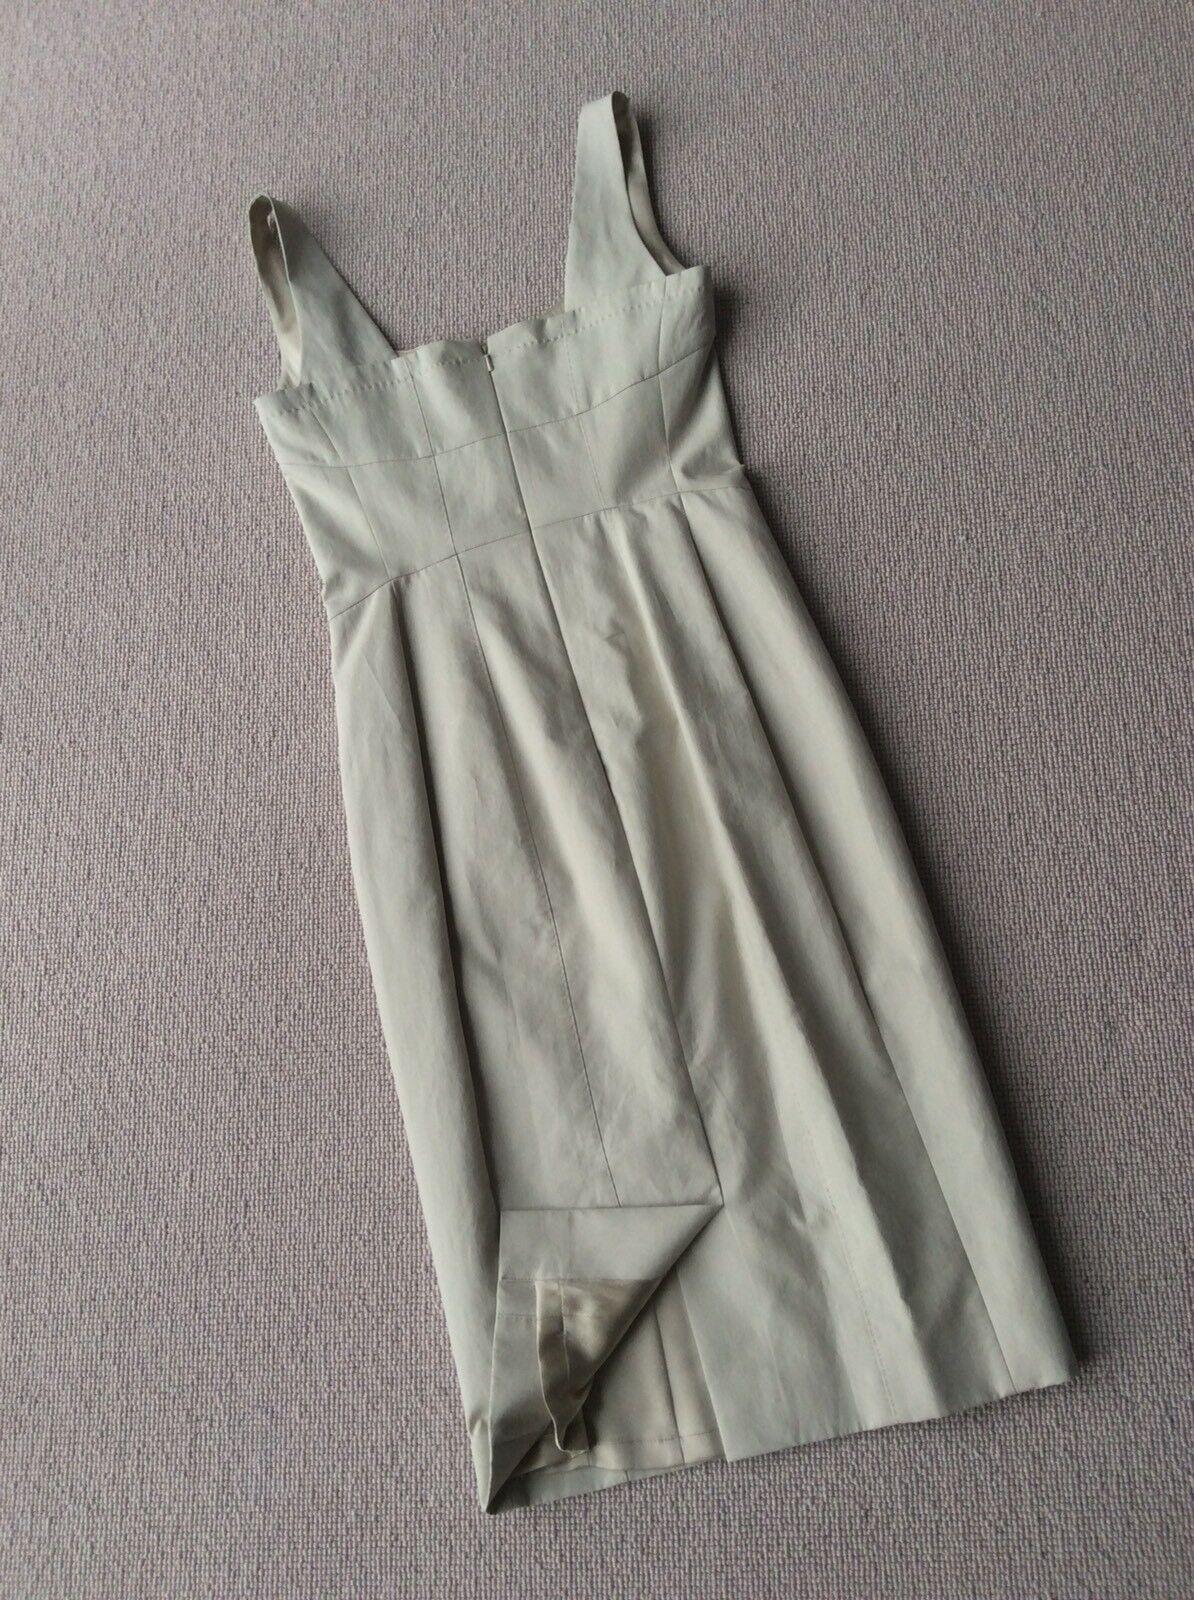 Designer Designer Designer AMANDA WAKELEY Elegant Stone Shift Dress, Silk Lined UK10 RRP 999eec